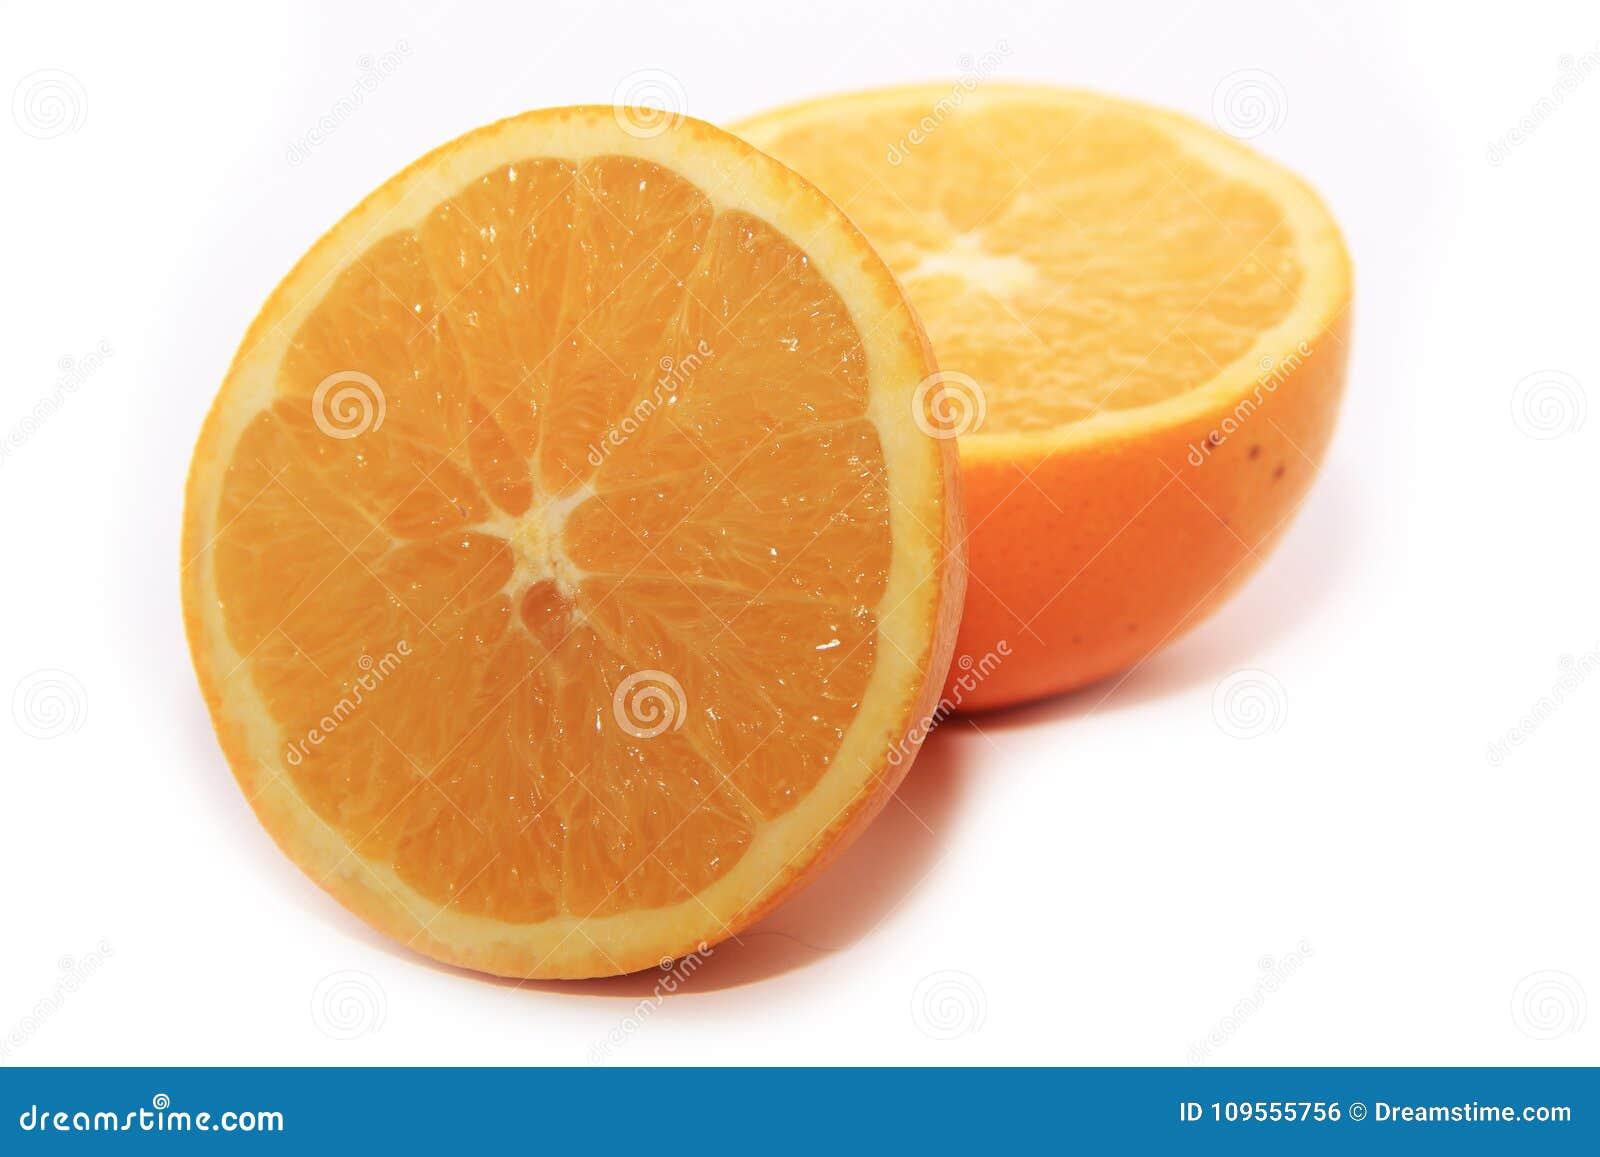 Juicy orange cut into halves on a white background